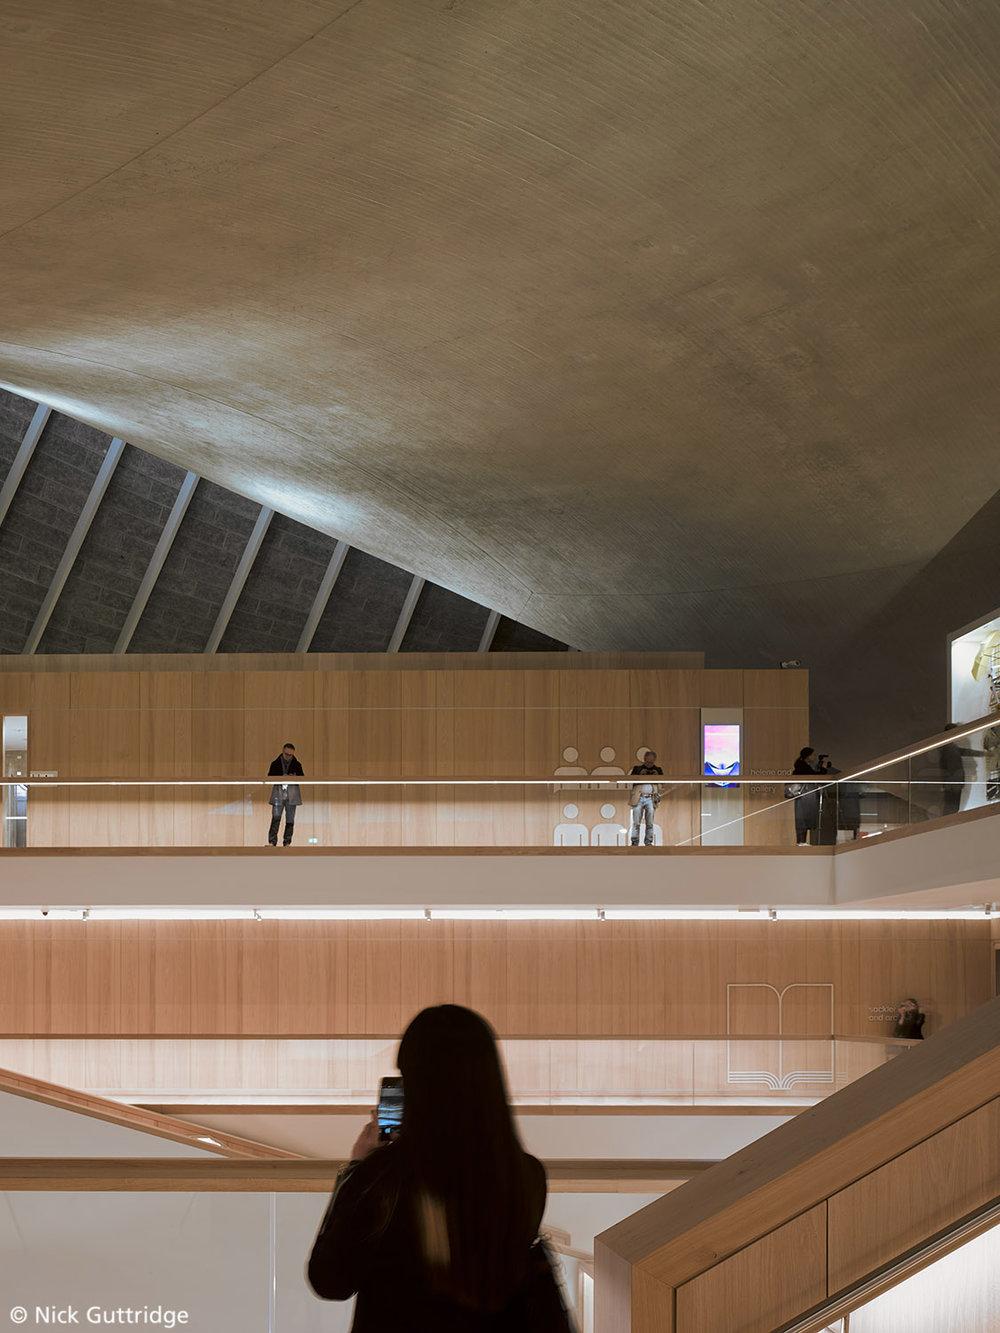 NGUT-1341-DesignMuseum-0024.jpg